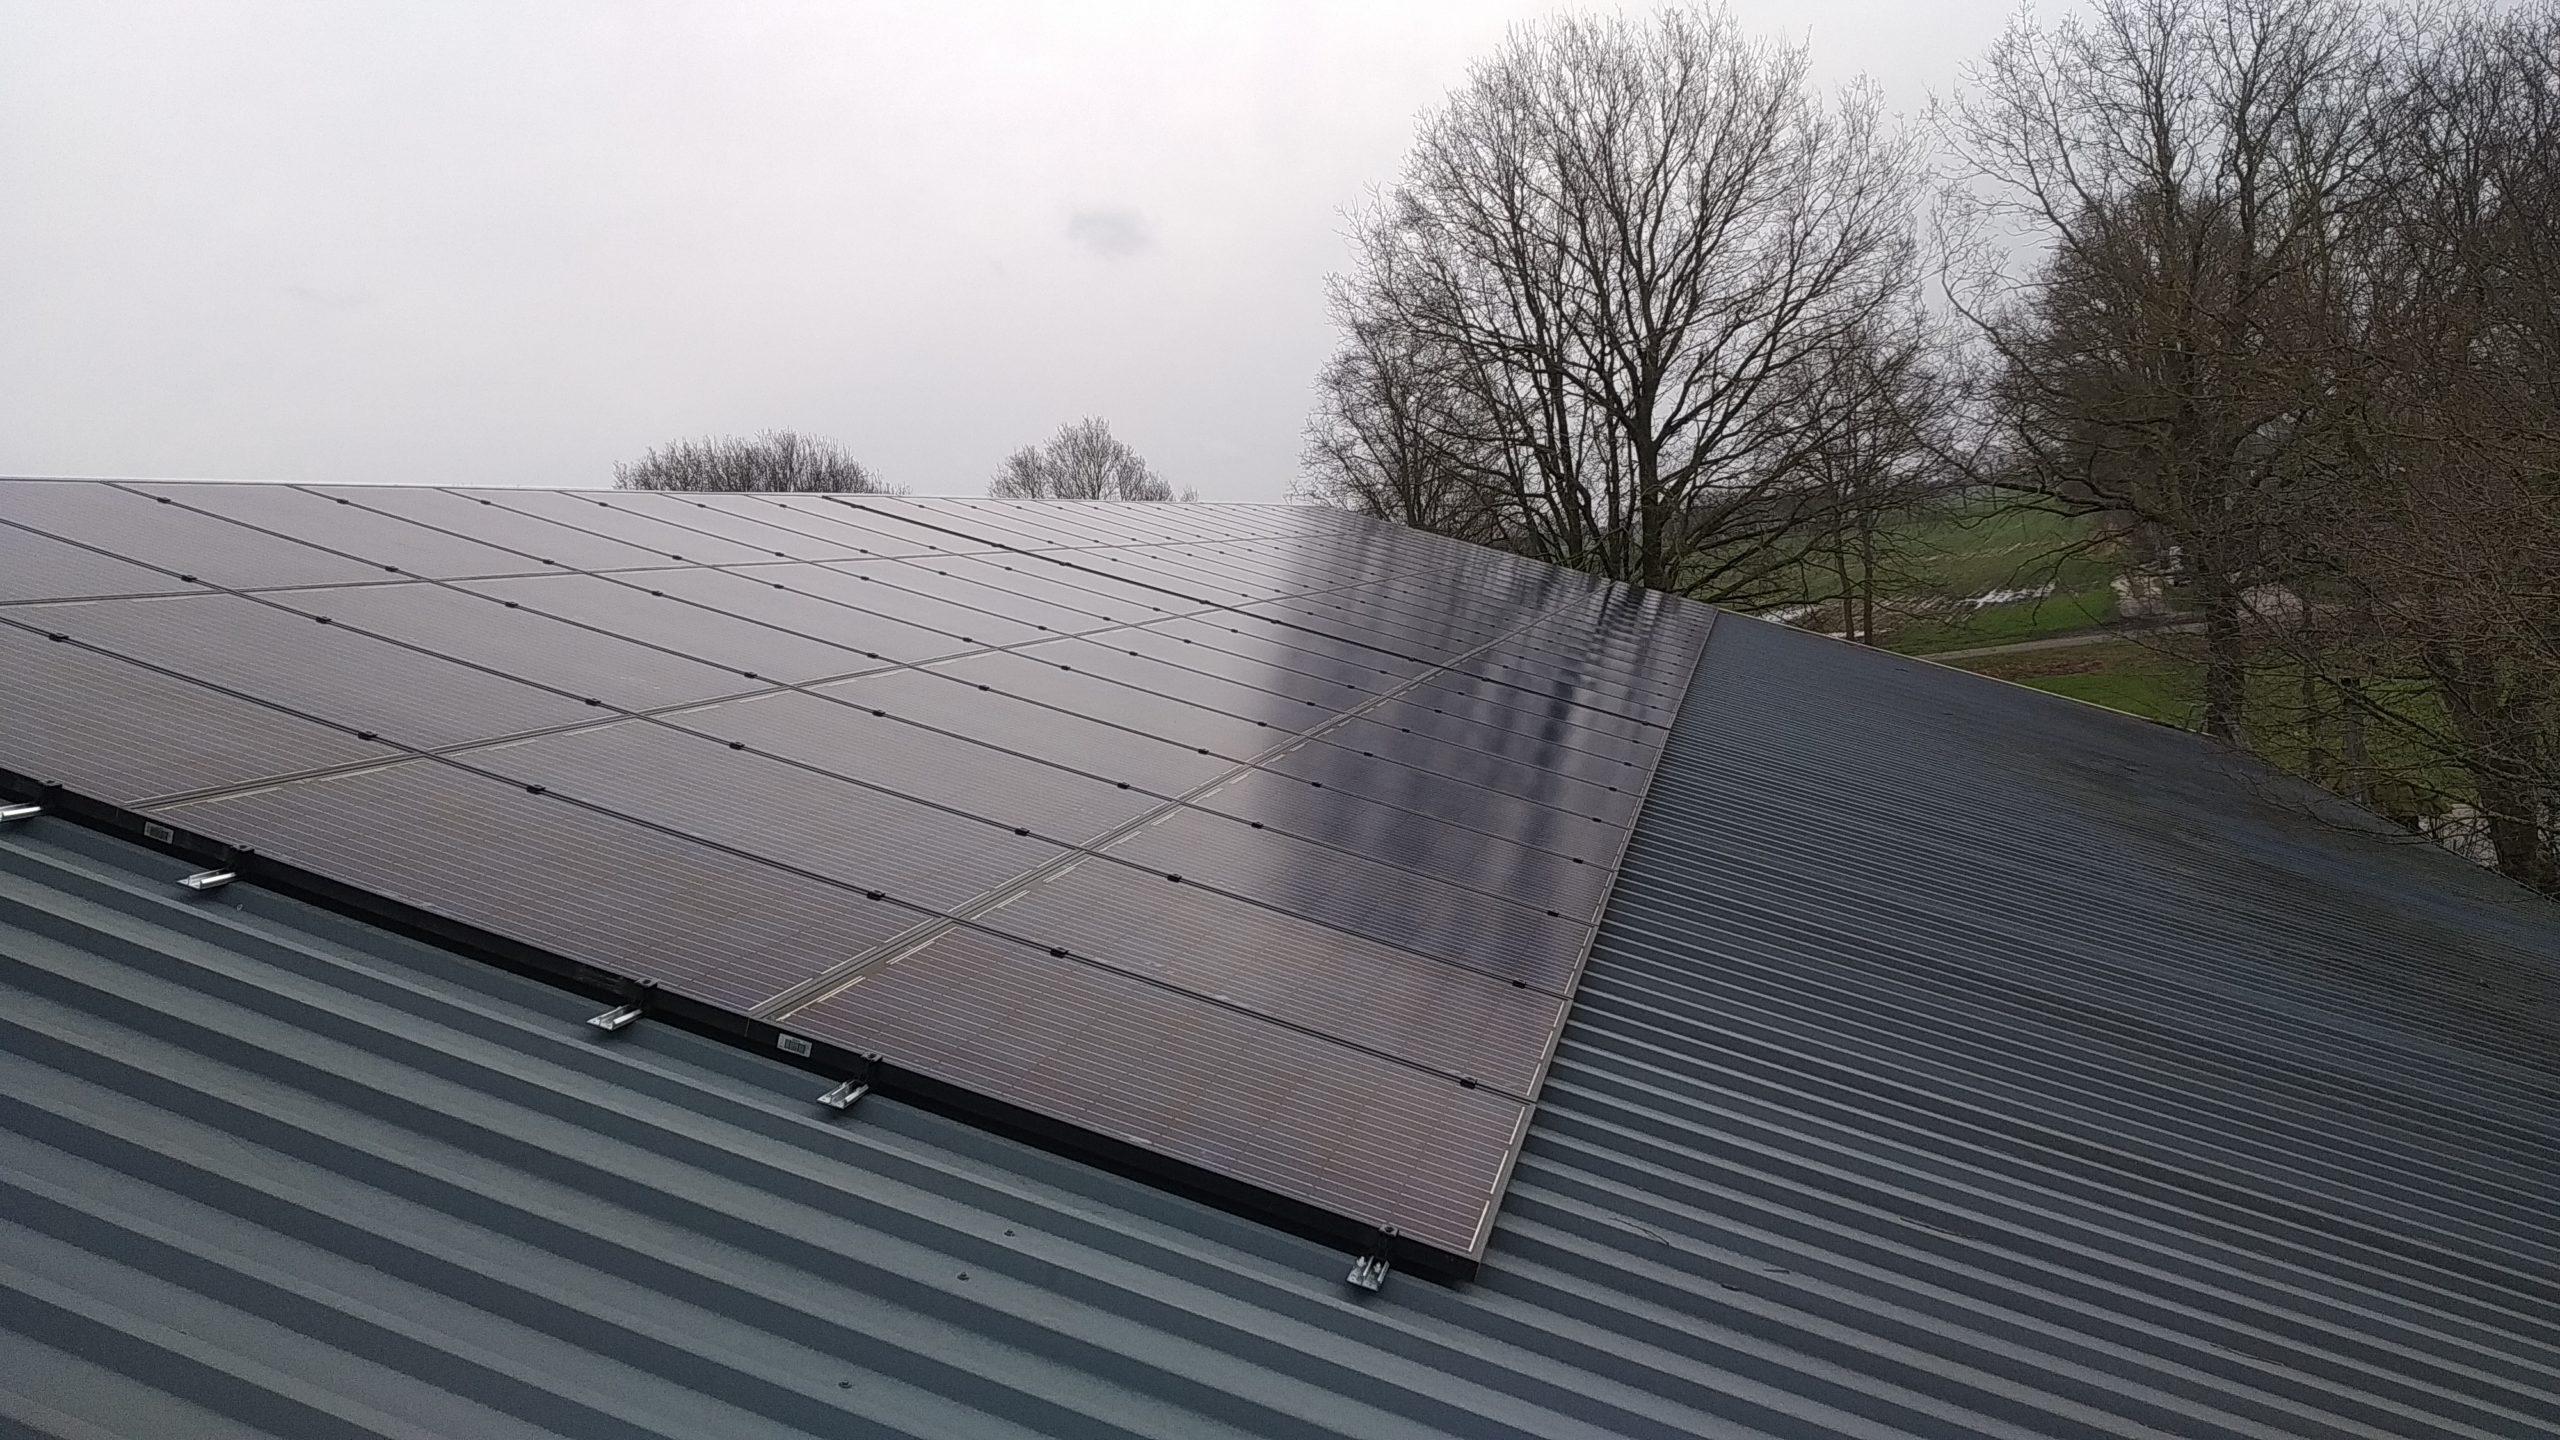 Centro Solar 215 zonnepanelen met SMA tripower omvormer Vroomshoop